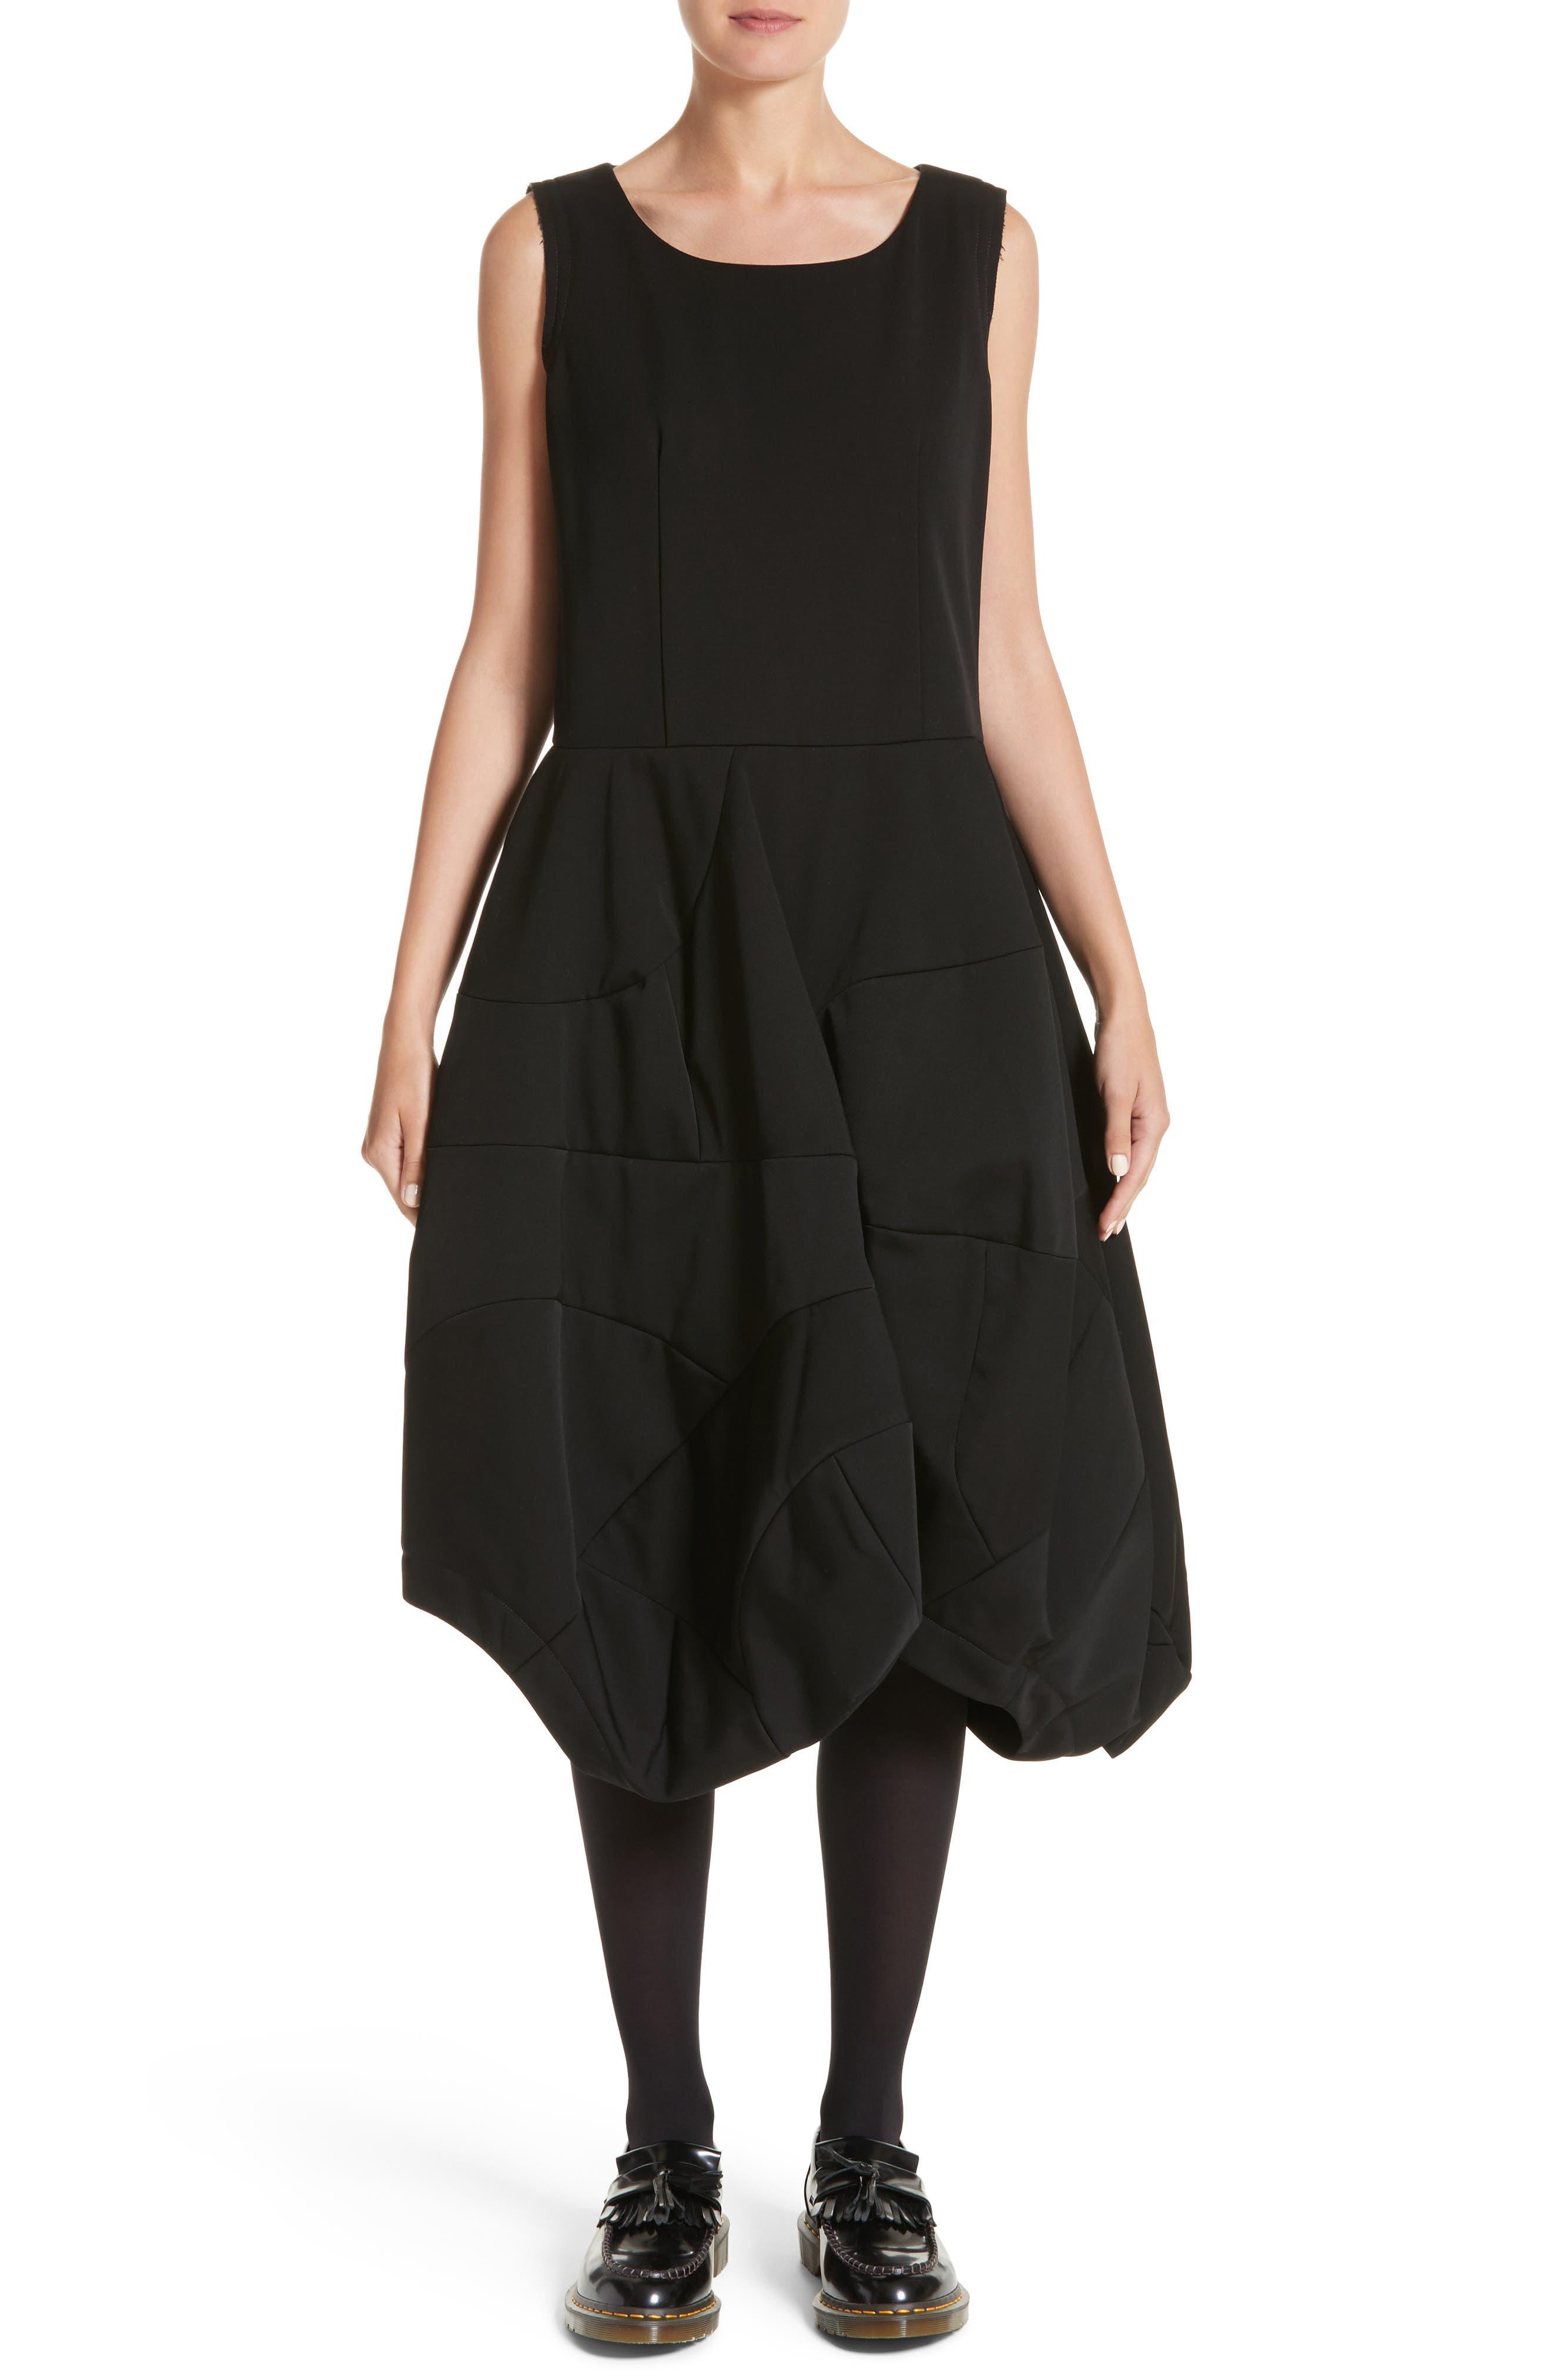 Alternate Image 1 Selected - Comme des Garçons Bending Skirt Wool Dress